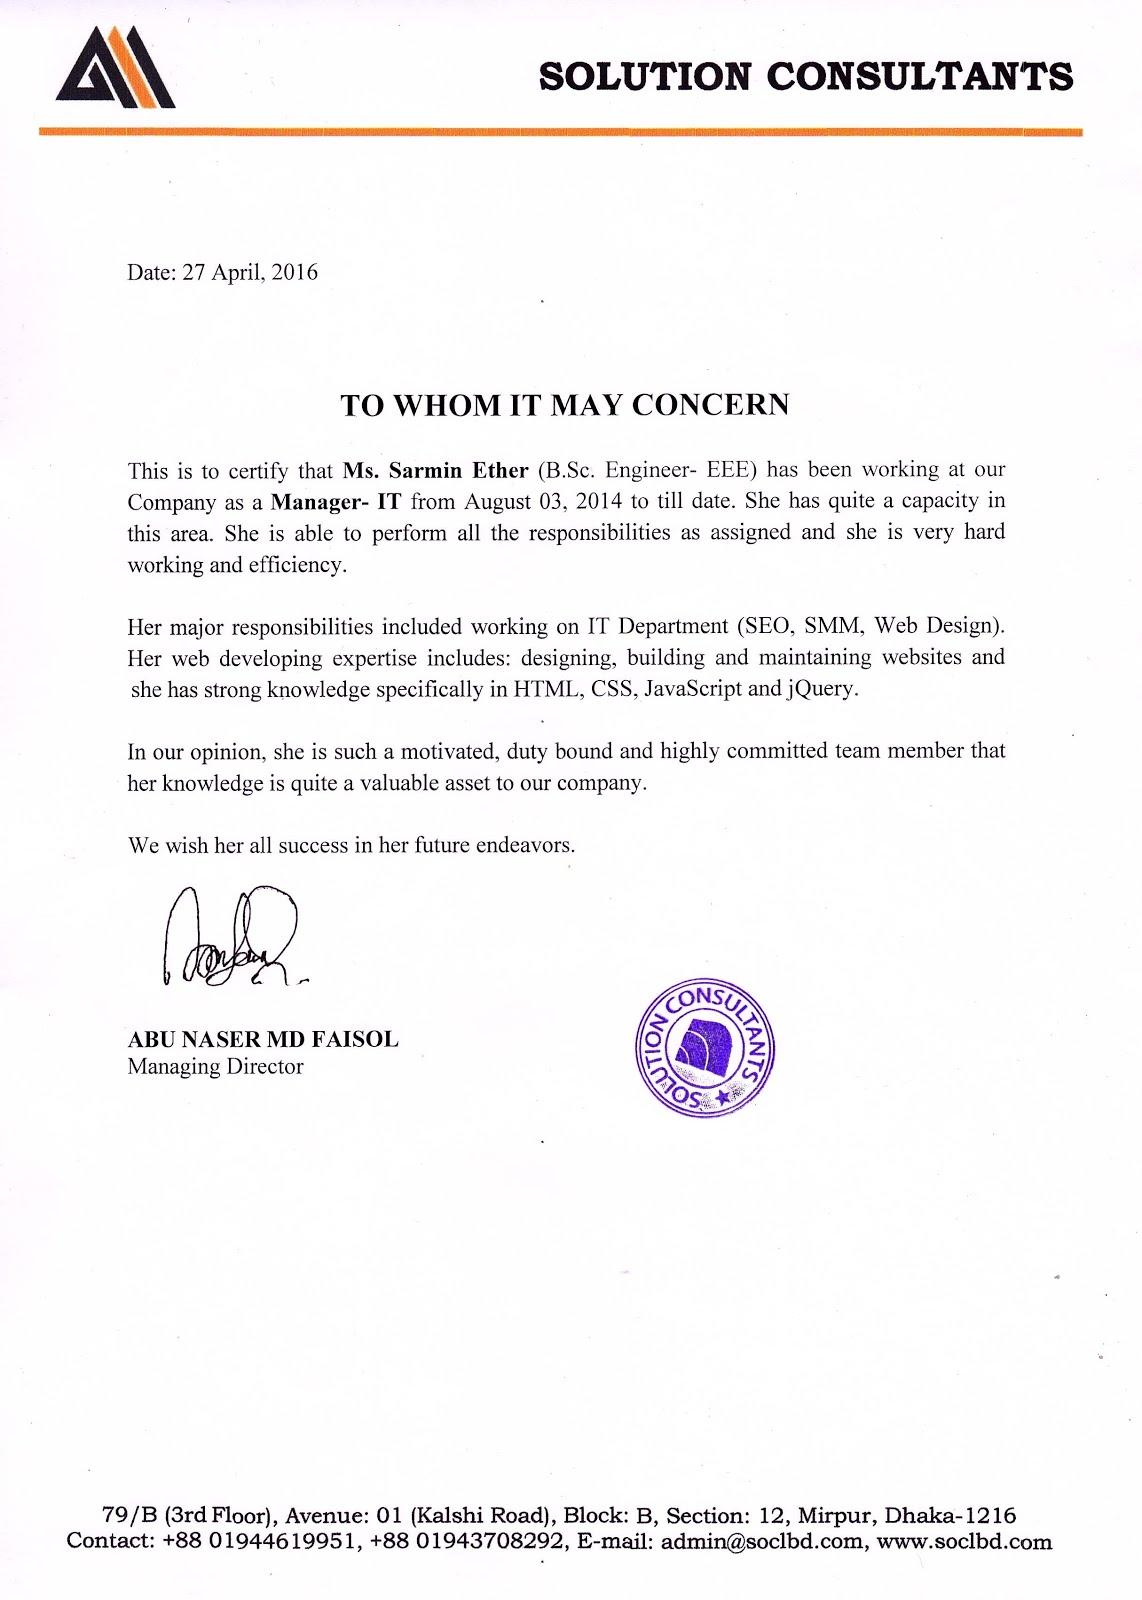 Resume of engineer sarmin ether job certificates xflitez Images